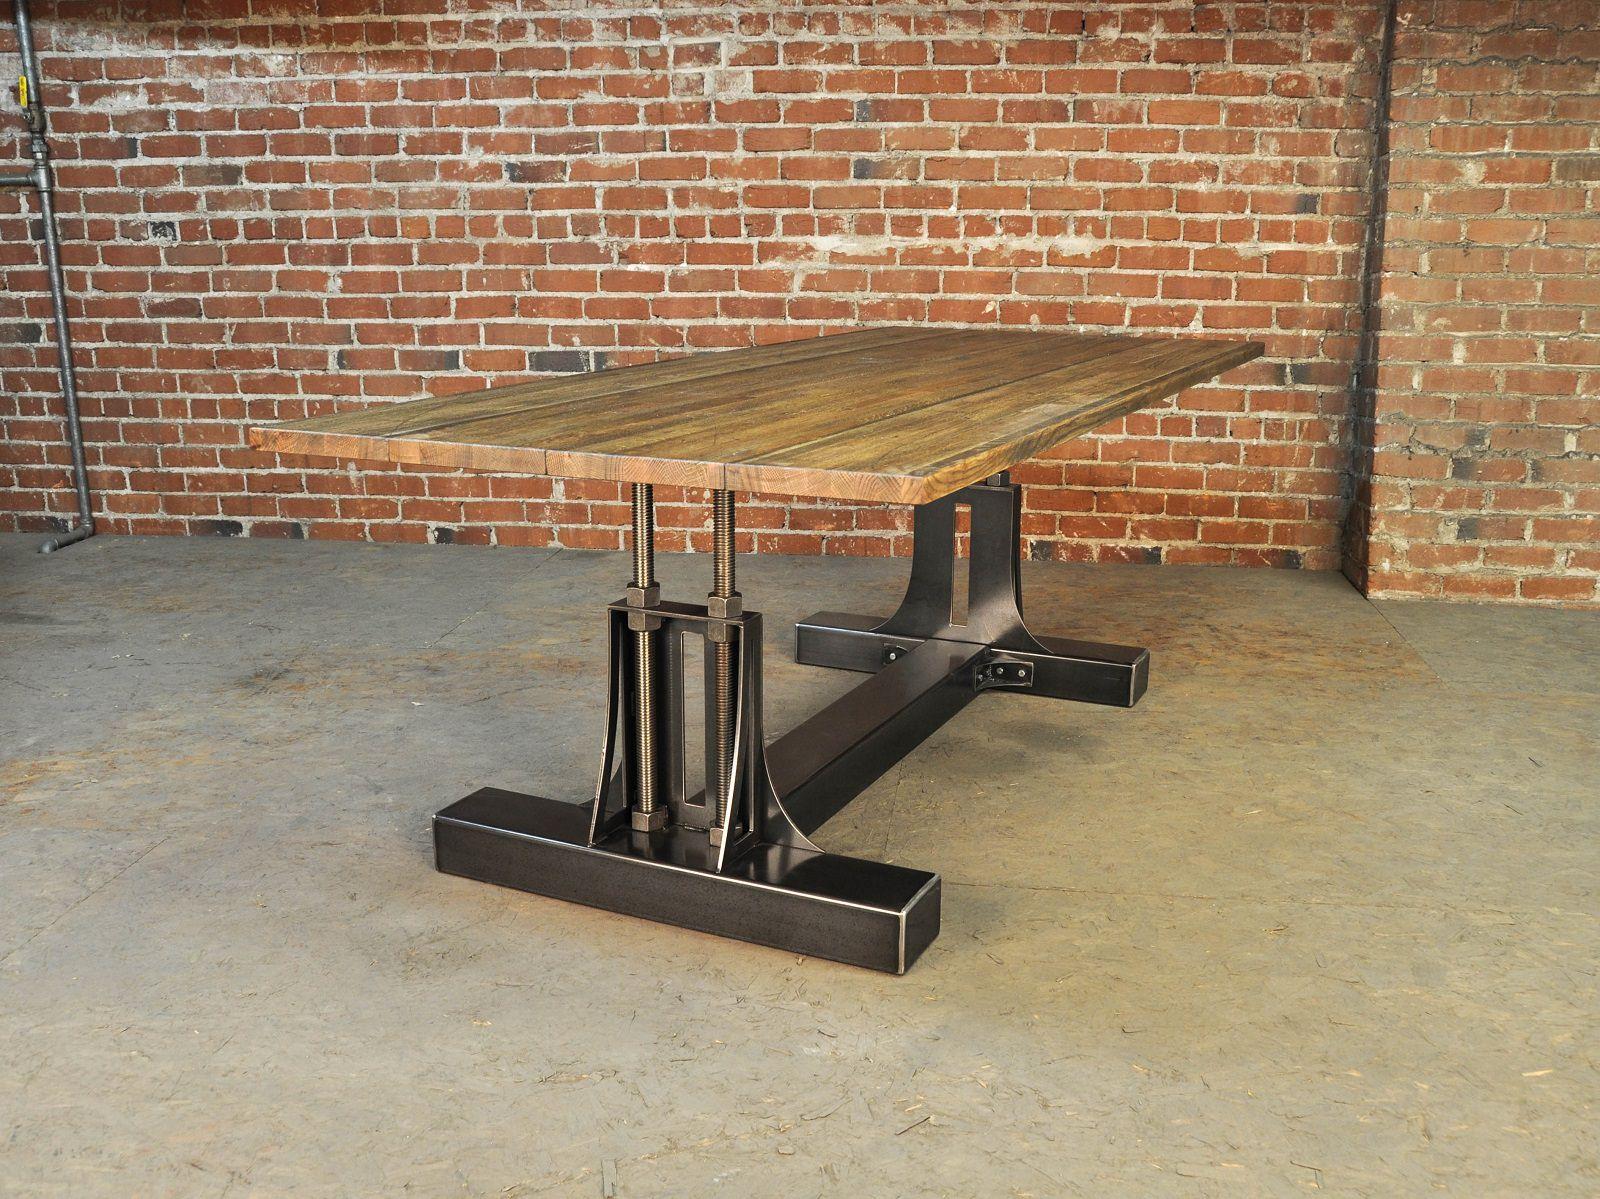 Aksen besi pada kaki meja yang dipadukan dengan kayu bergaya rustic - source: keribrownhomes.com